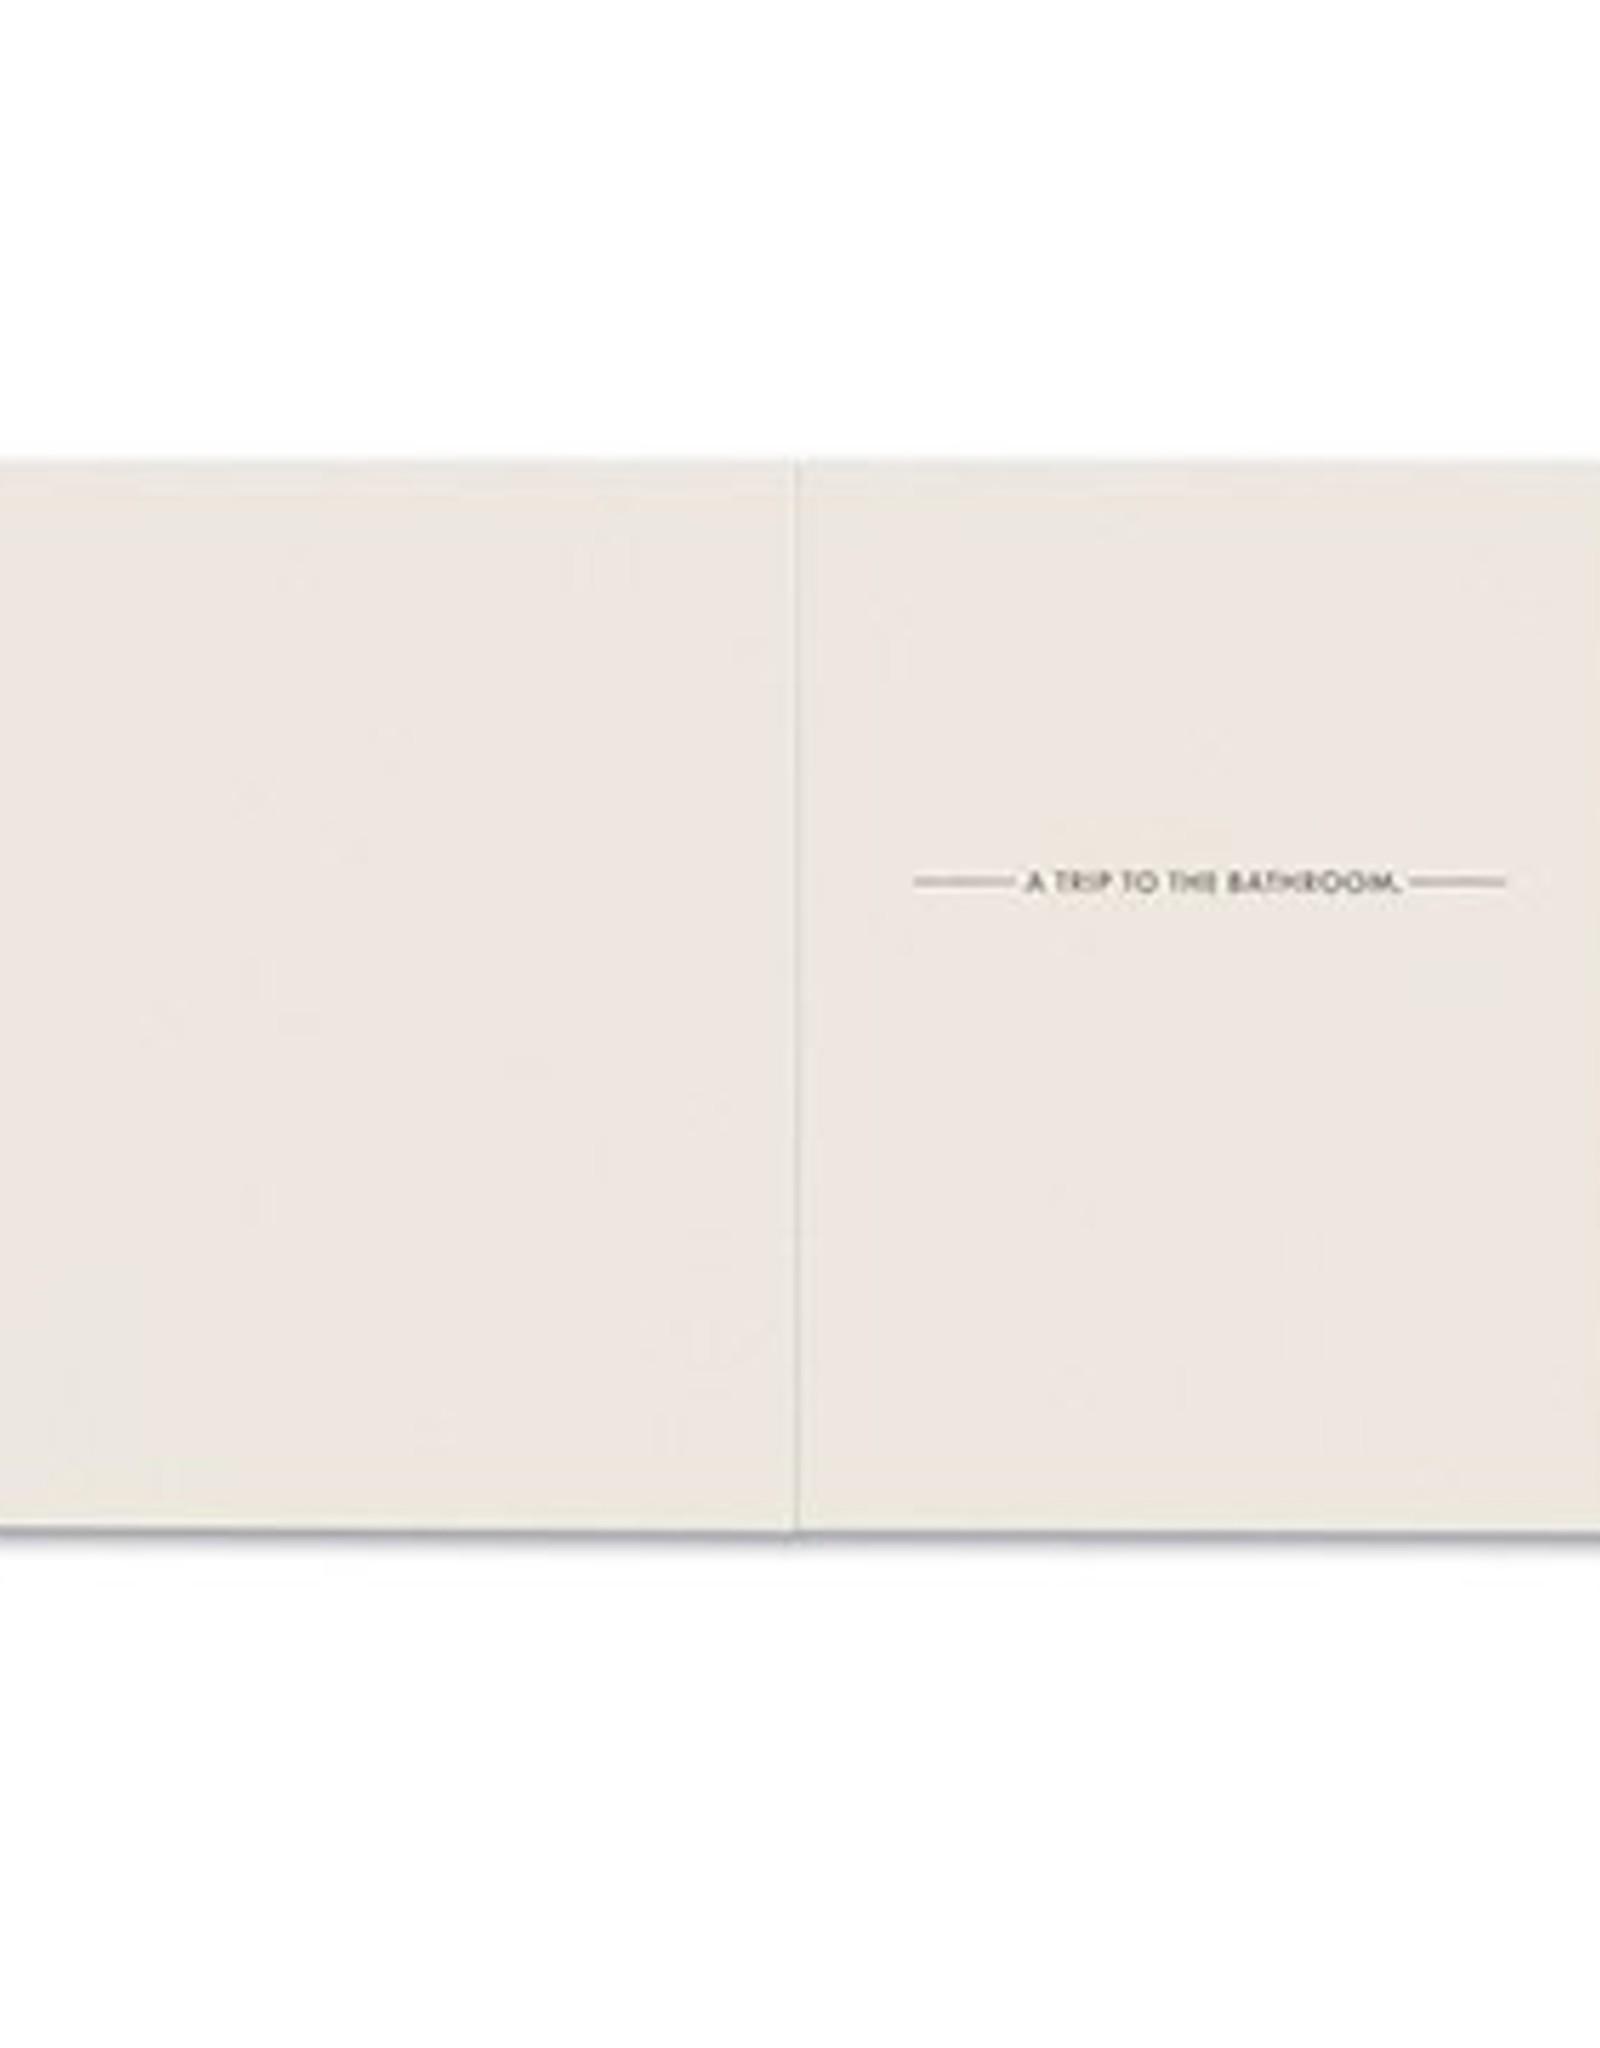 Frank & Funny Encouragement Card- 6550